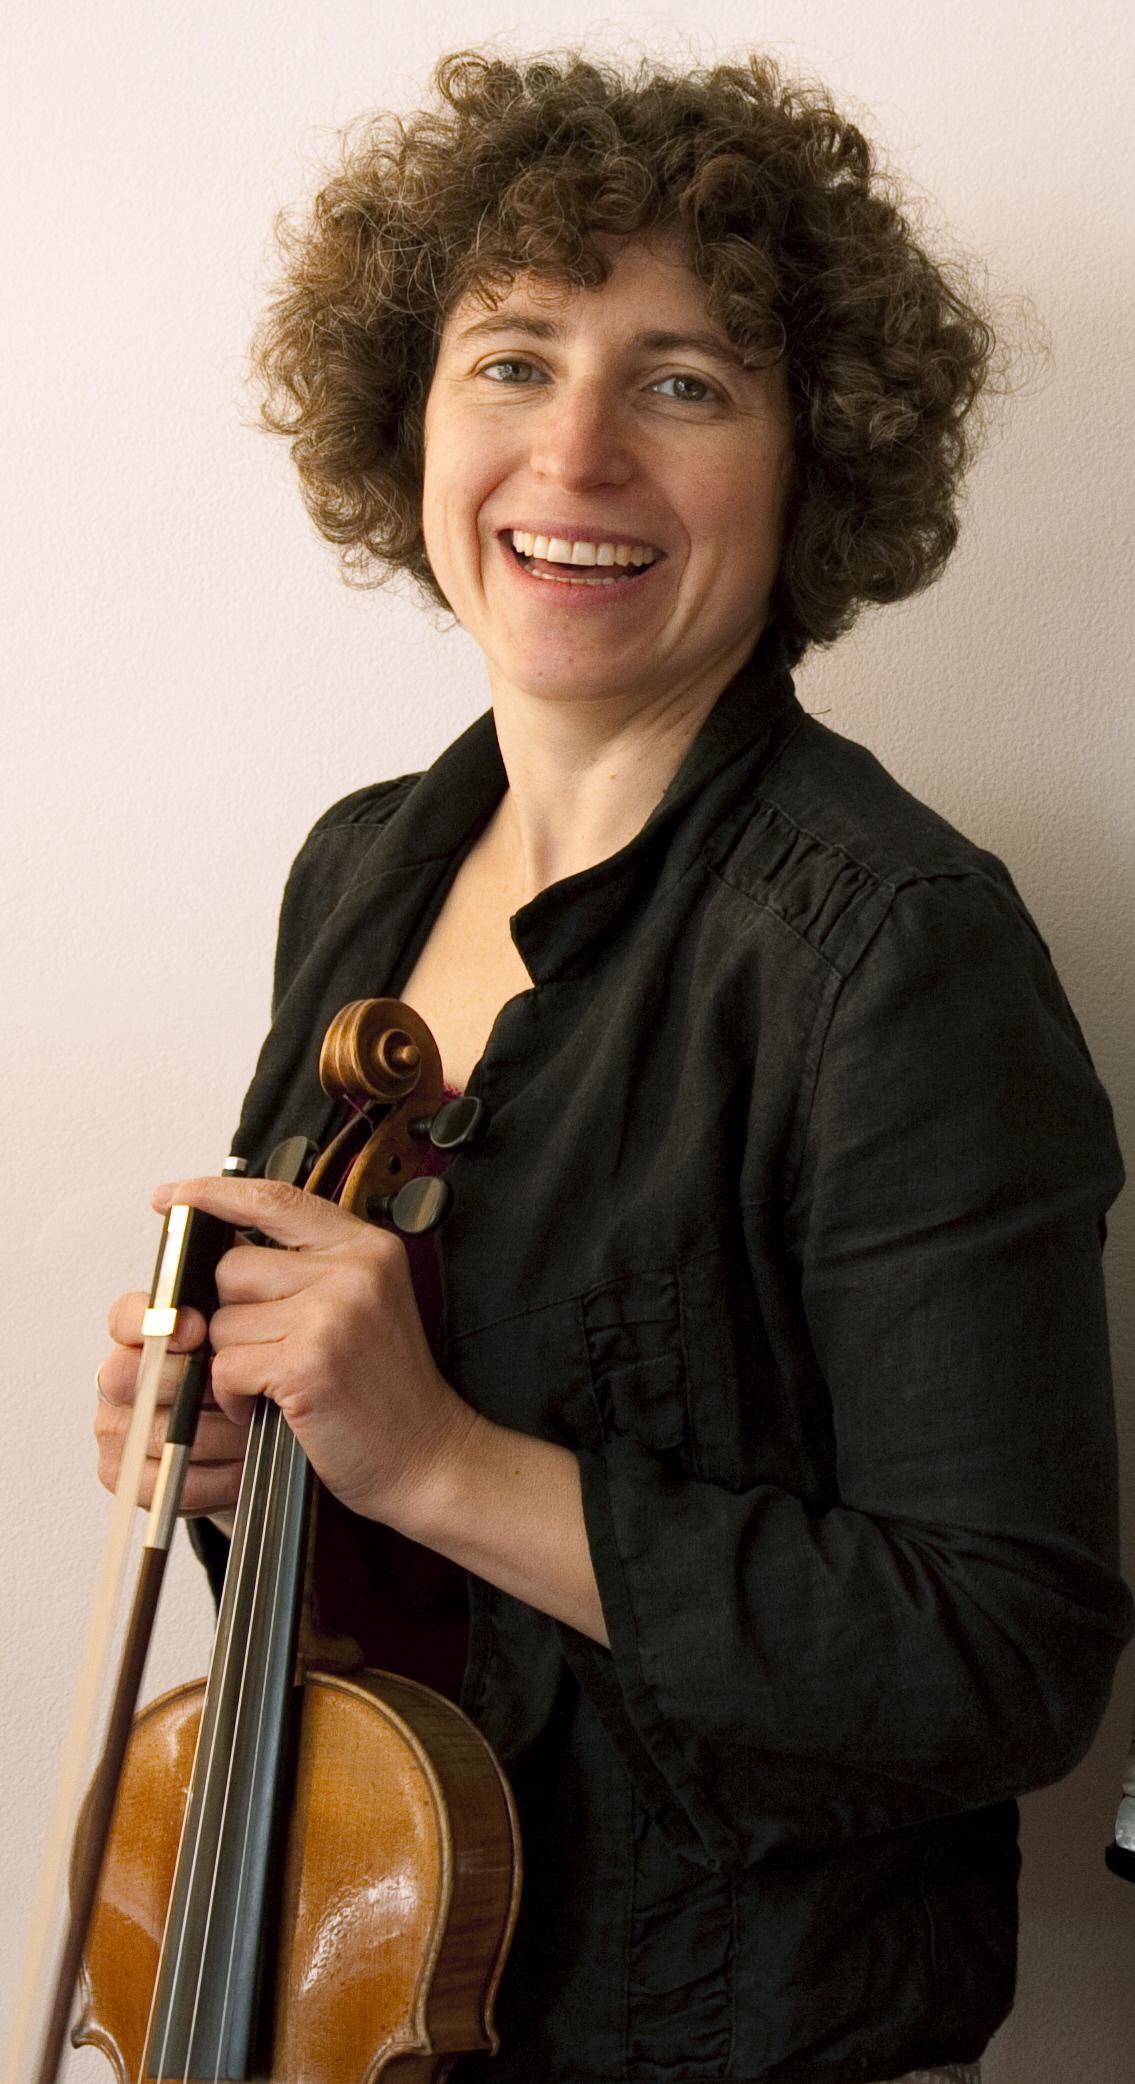 Ilana Cravitz